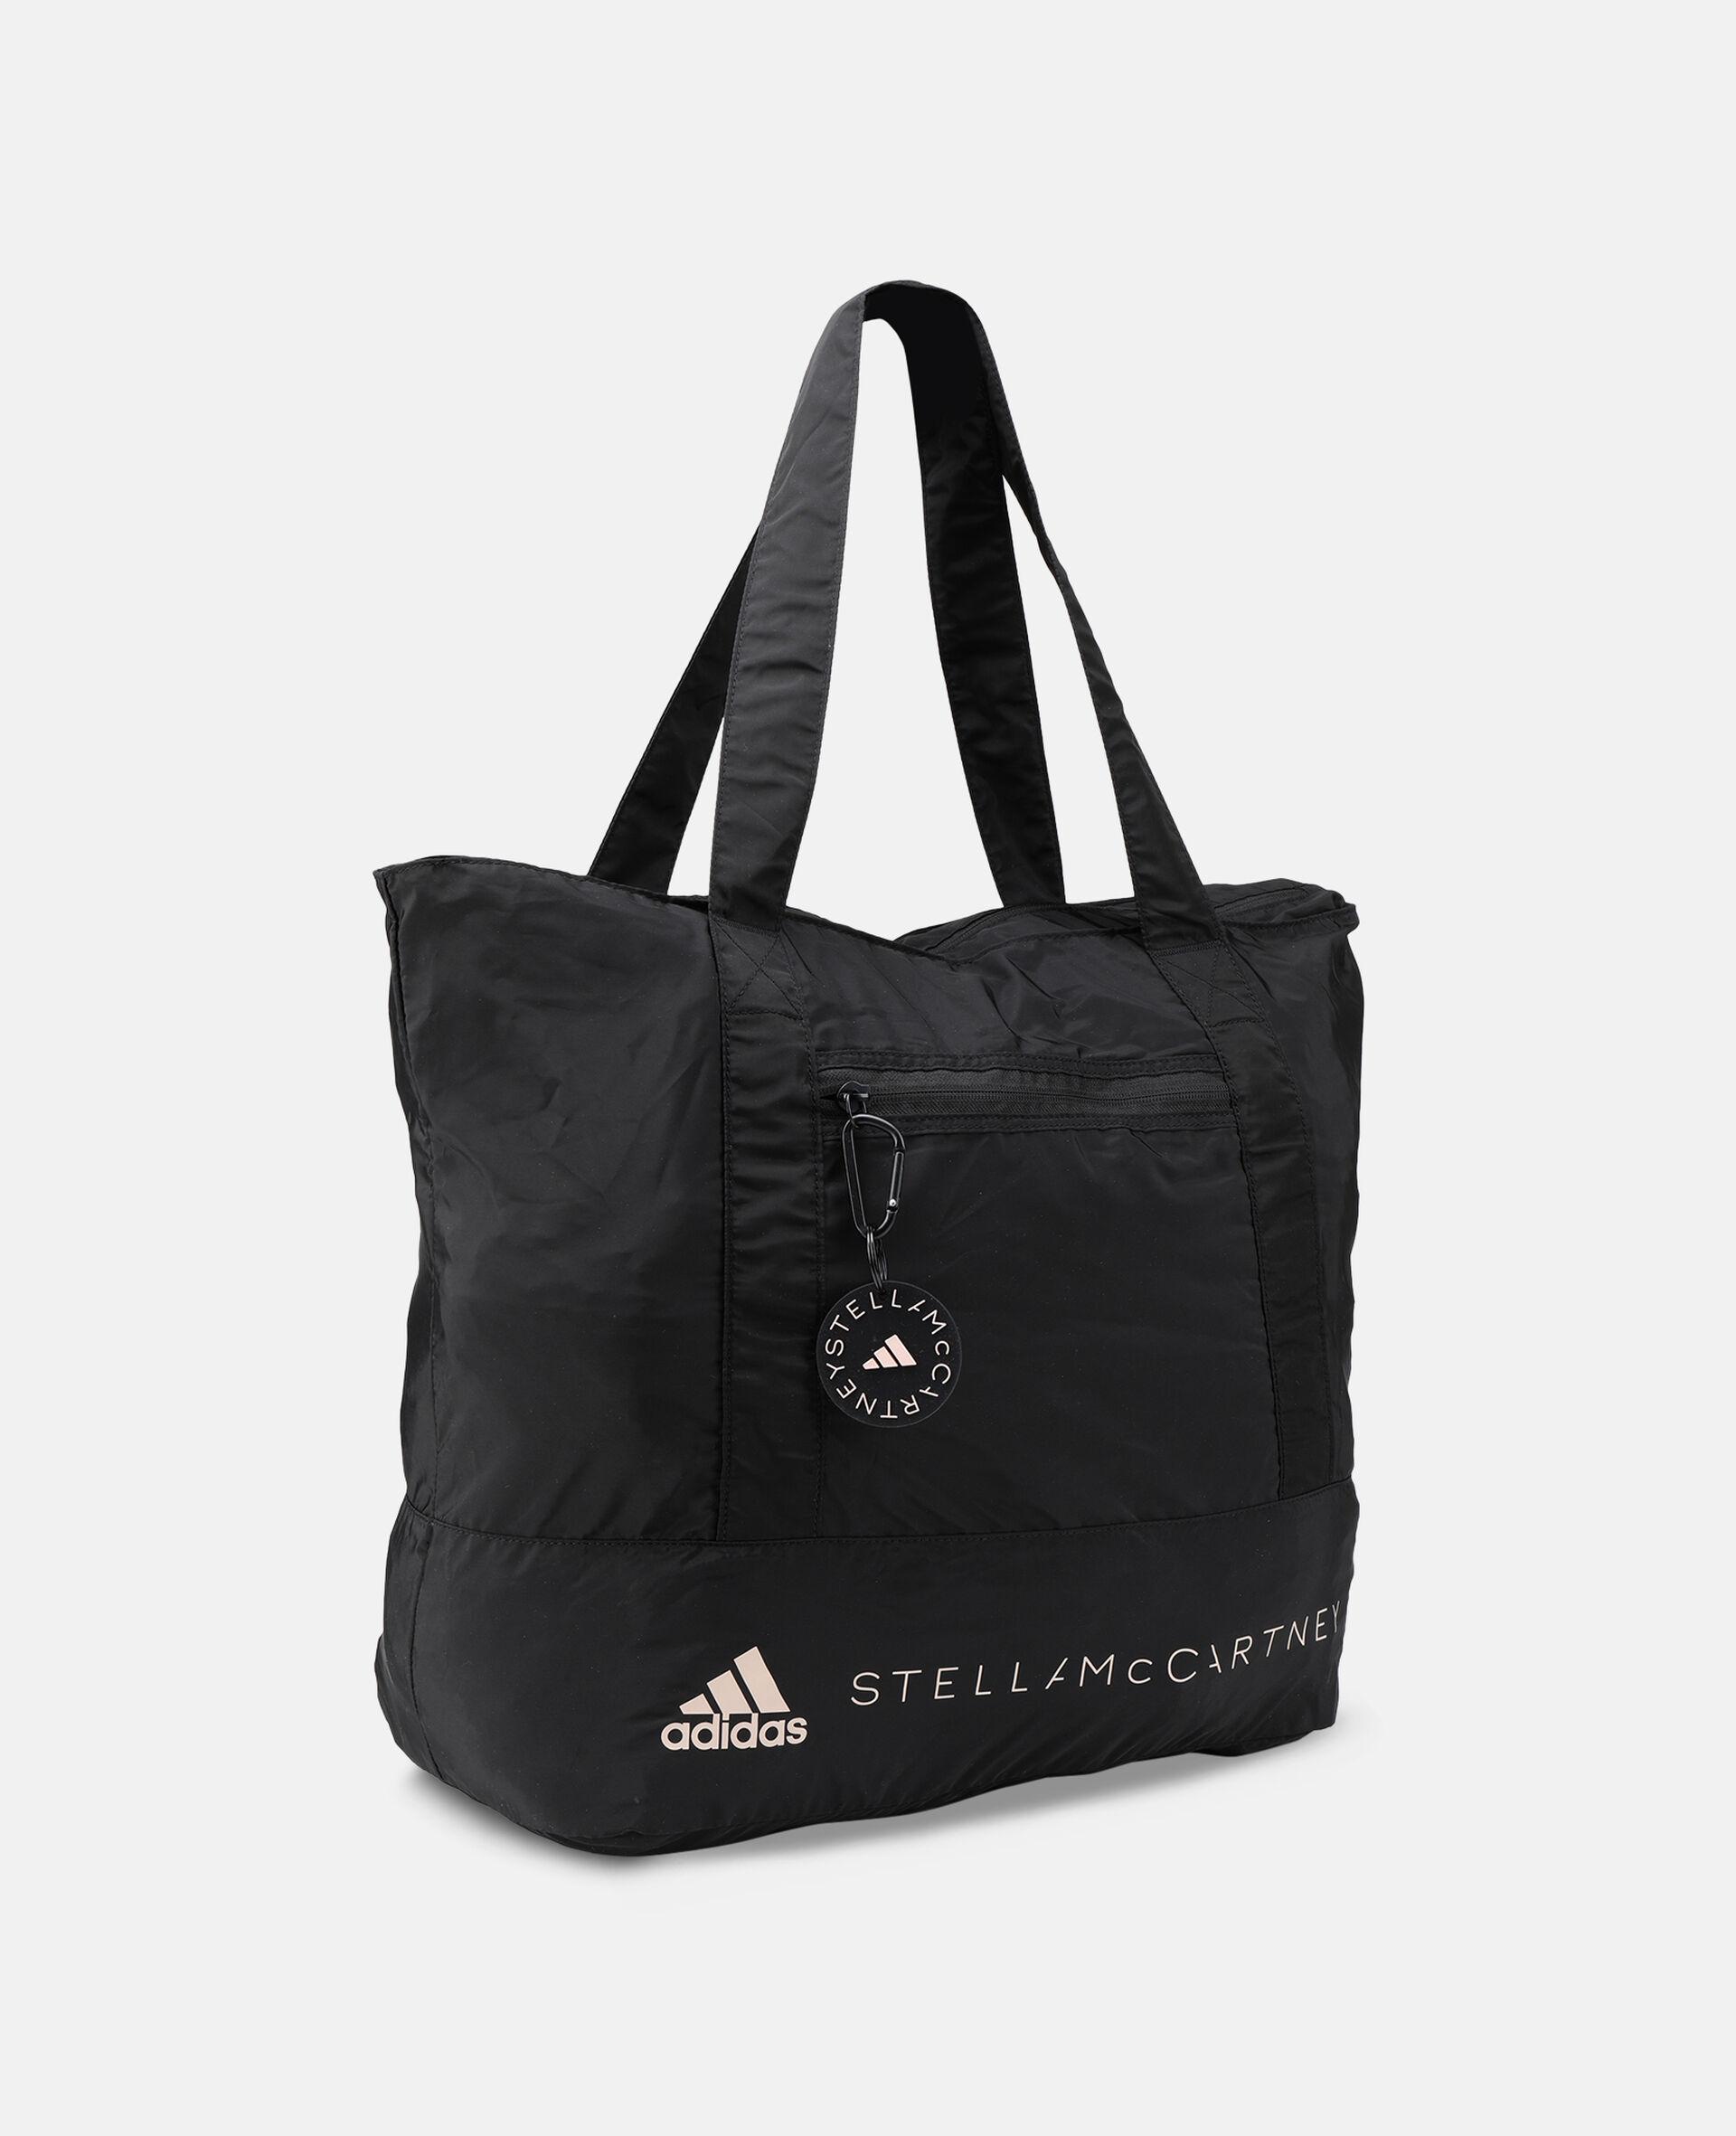 Black Printed Tote Bag -Black-large image number 1